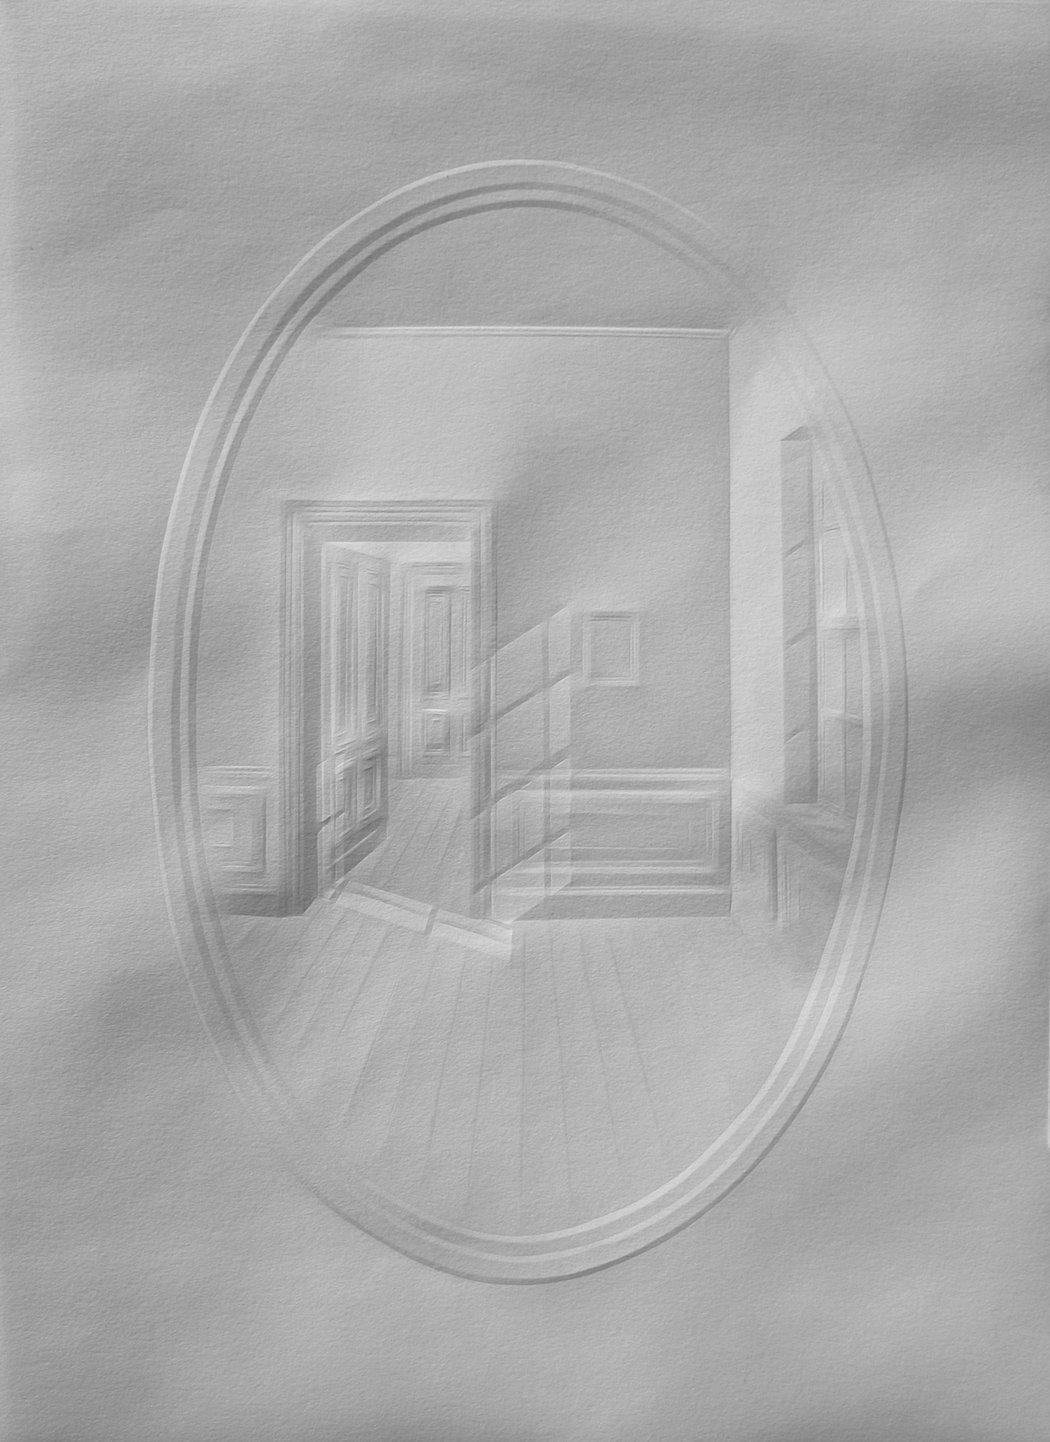 simonschubert(light in mirror),2015, 35cm x 25cm